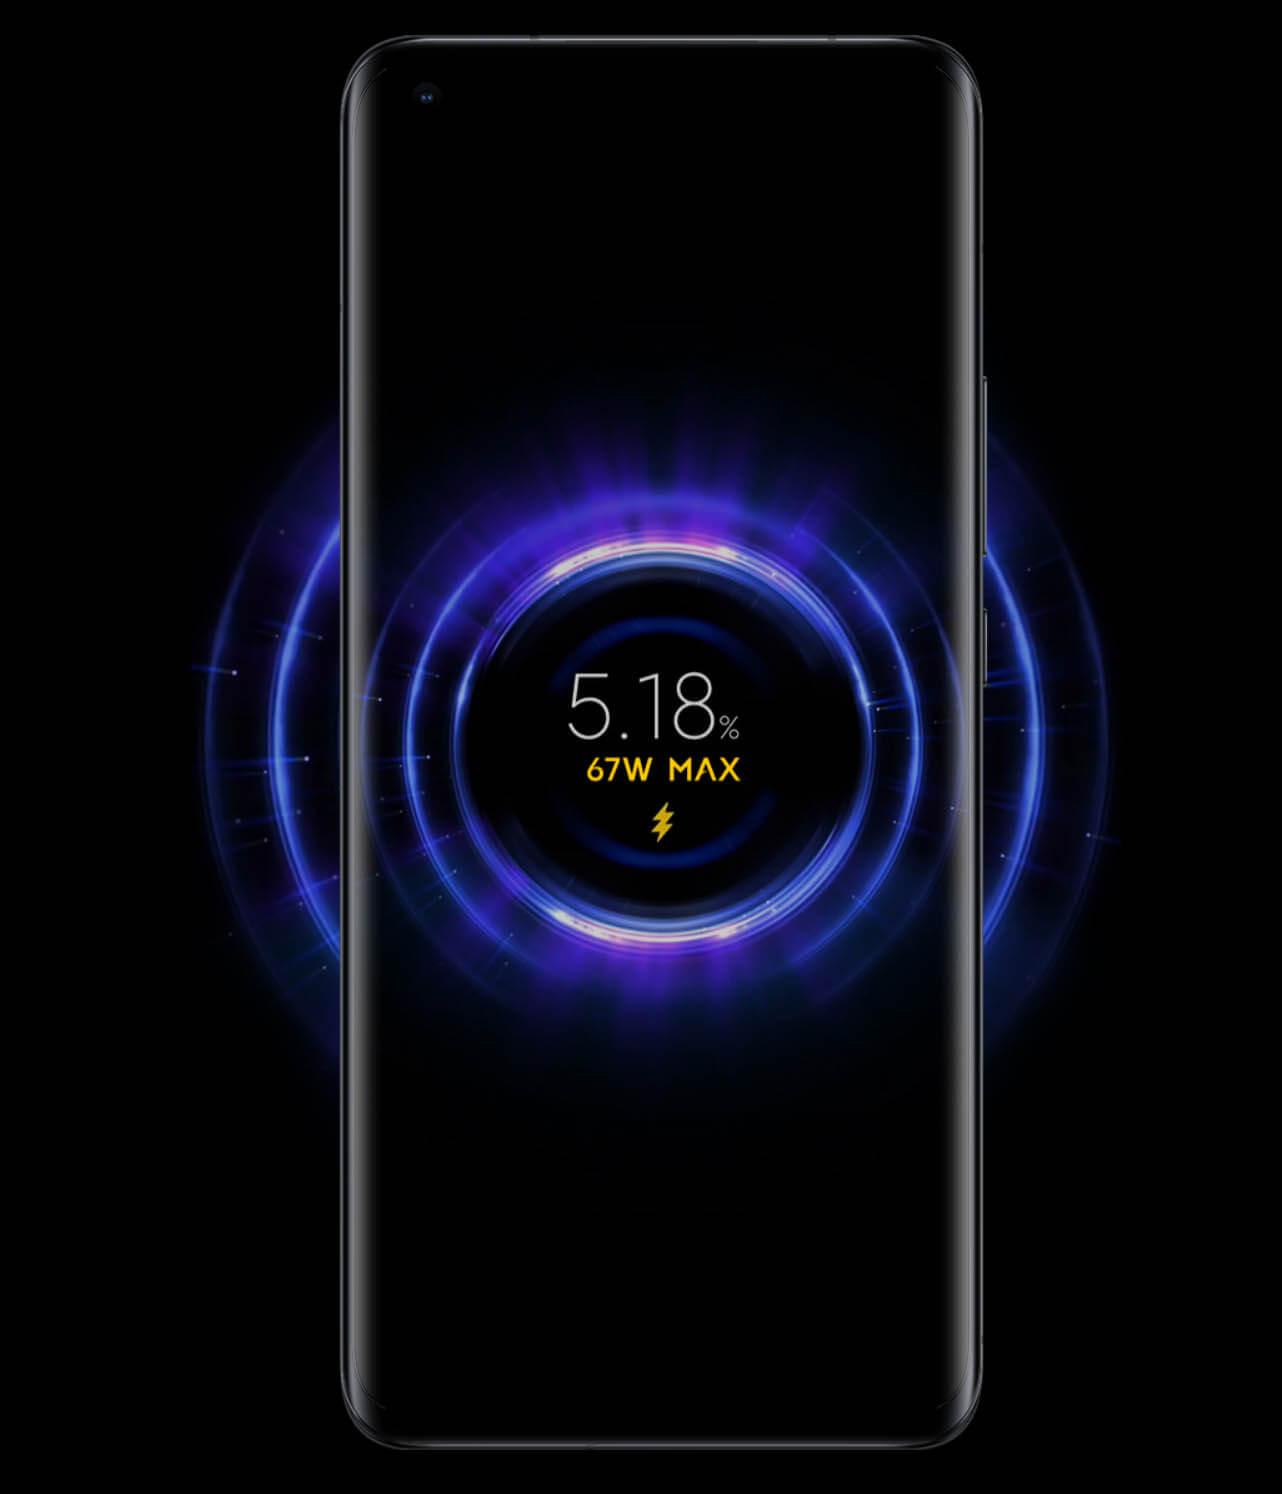 Xiaomi Mi 11 Ultraは最大67Wのワイヤレス充電に対応